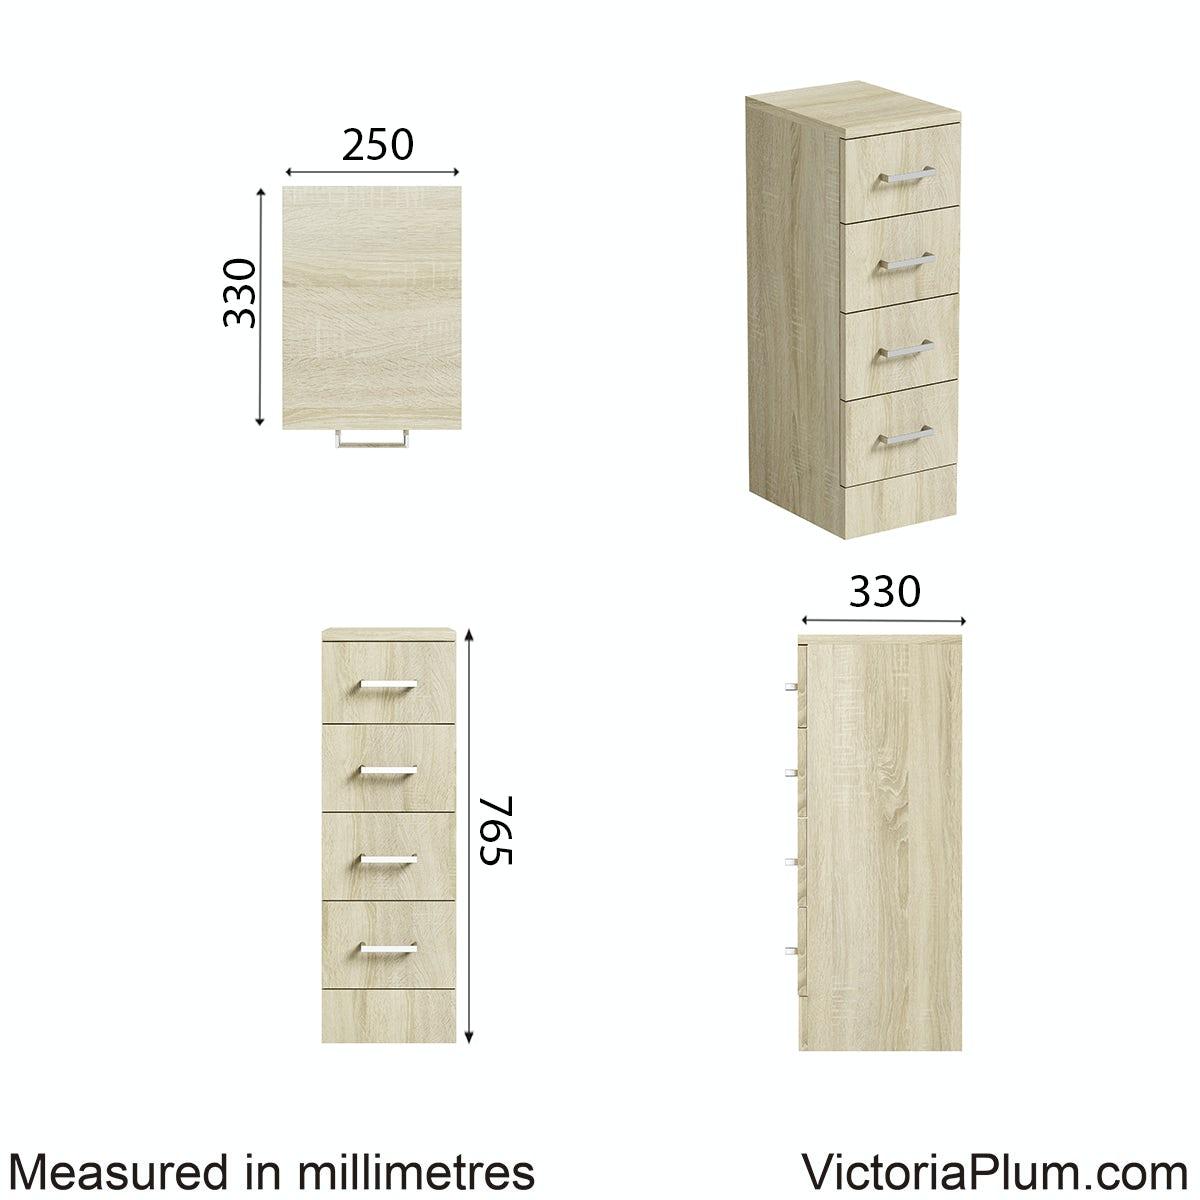 Dimensions for Orchard Eden oak multi drawer unit 330mm